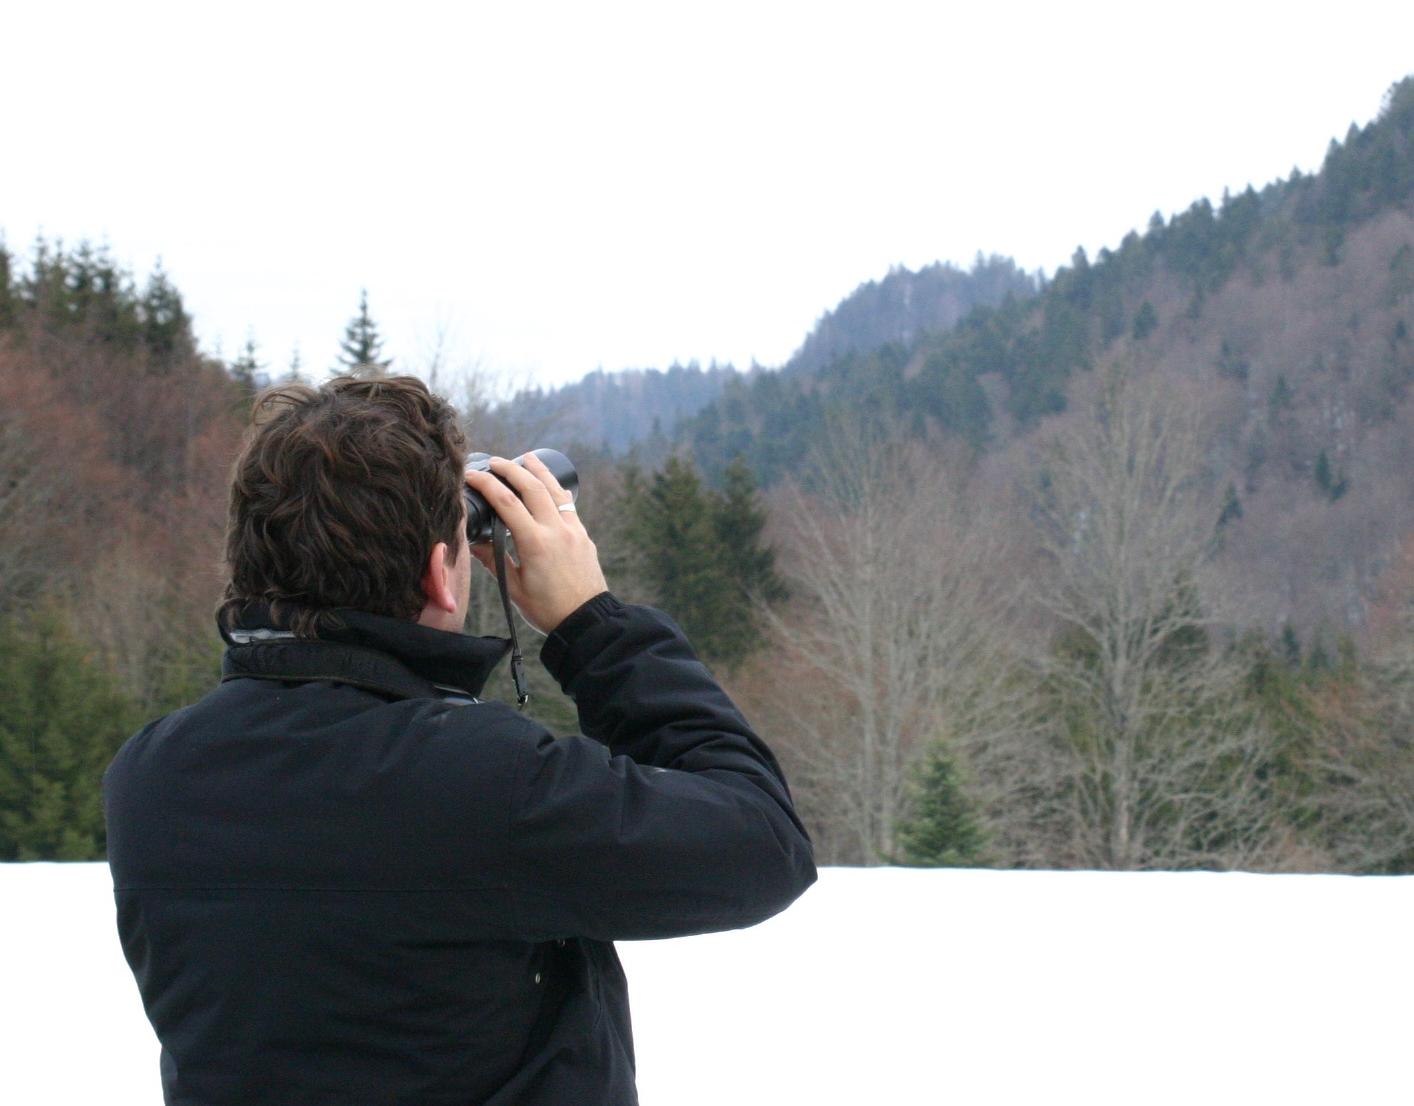 https://cdnfiles2.biolovision.net/franche-comte.lpo.fr/userfiles/Modedemploi/observationJaseurJuraPetitjean-retouch.jpg